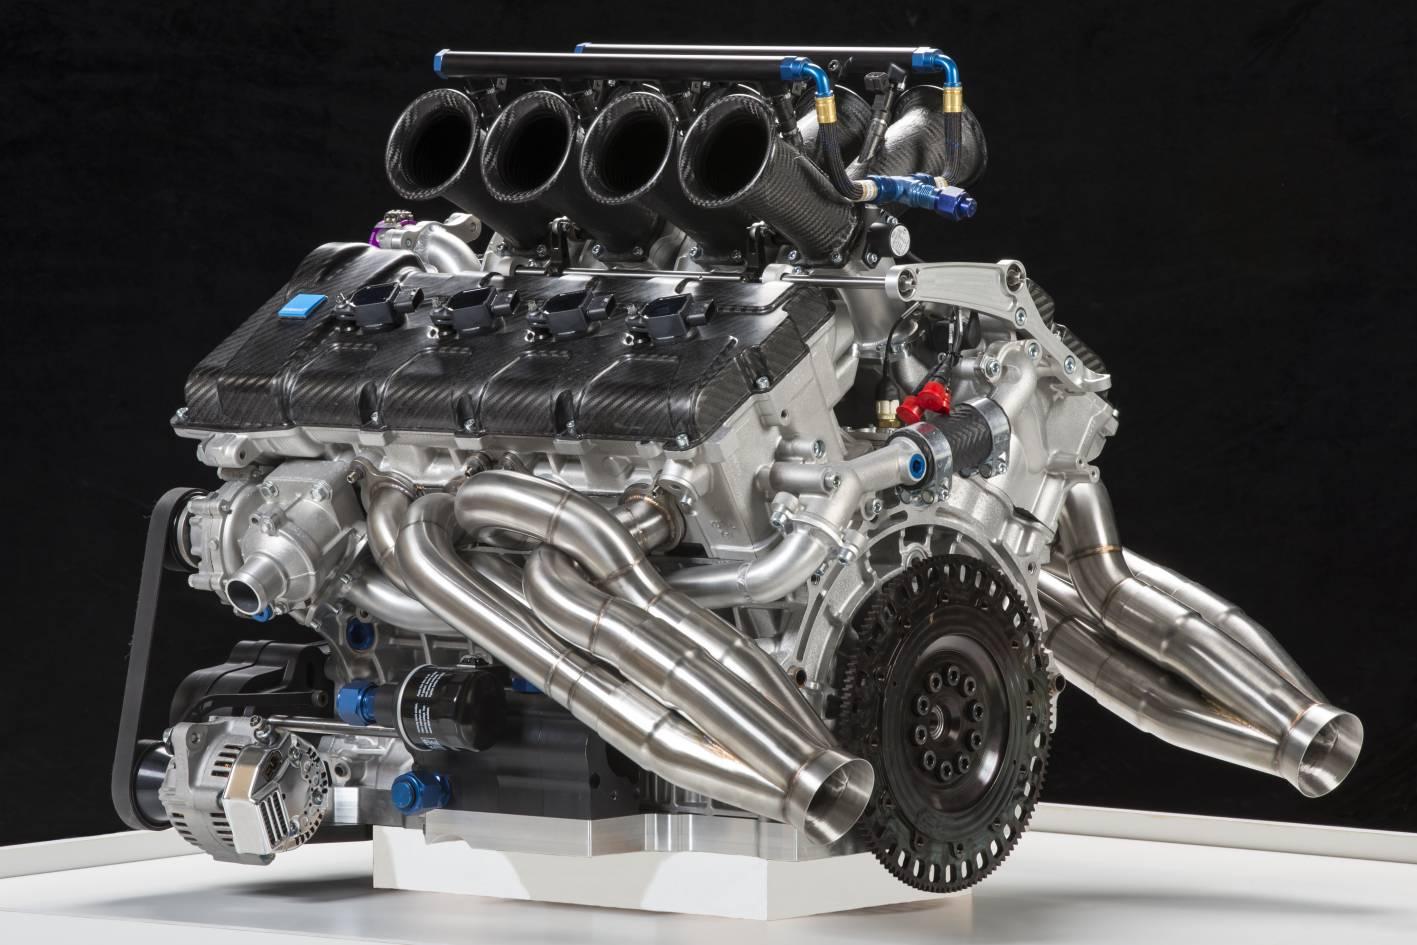 Volvo S60 V8 Supercar Engine Revealed Performancedrive